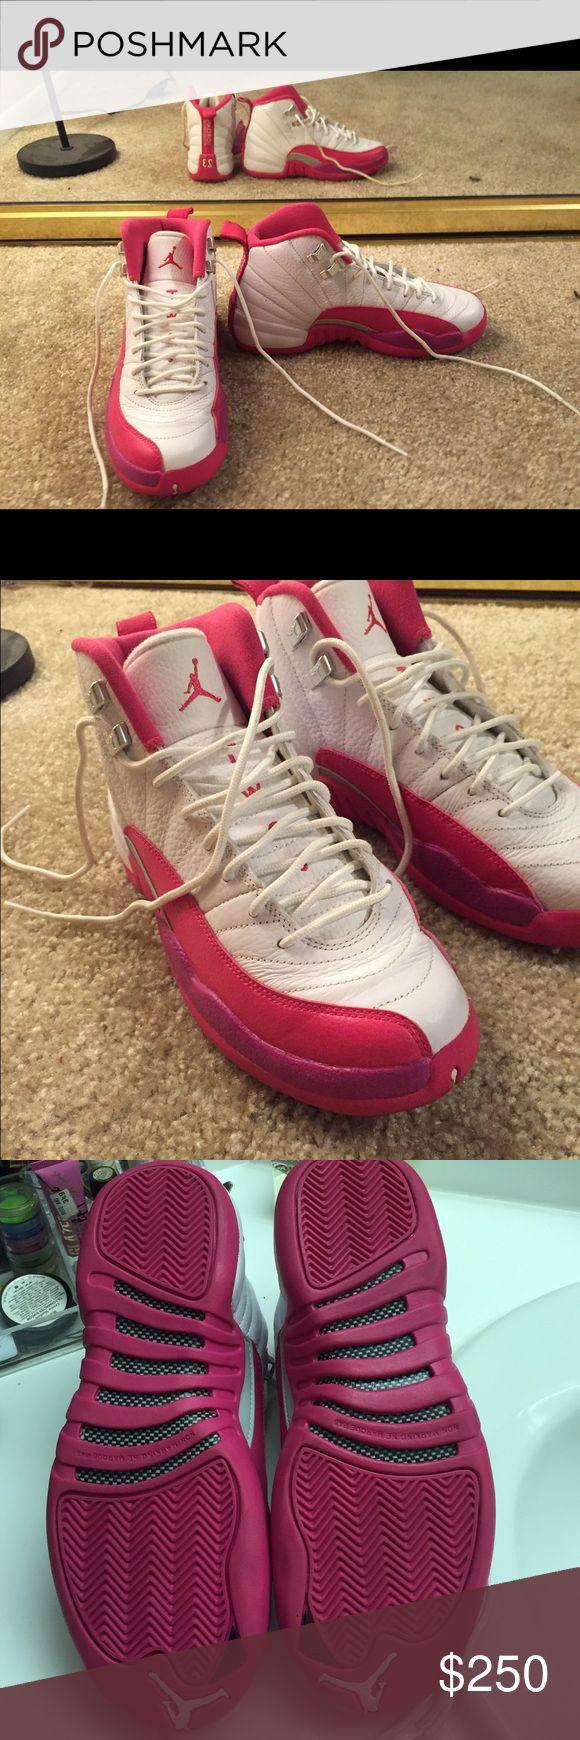 3d3a78f5c0a68f ... Vivid Pink and White Jordan 12s High Tops- LE ...